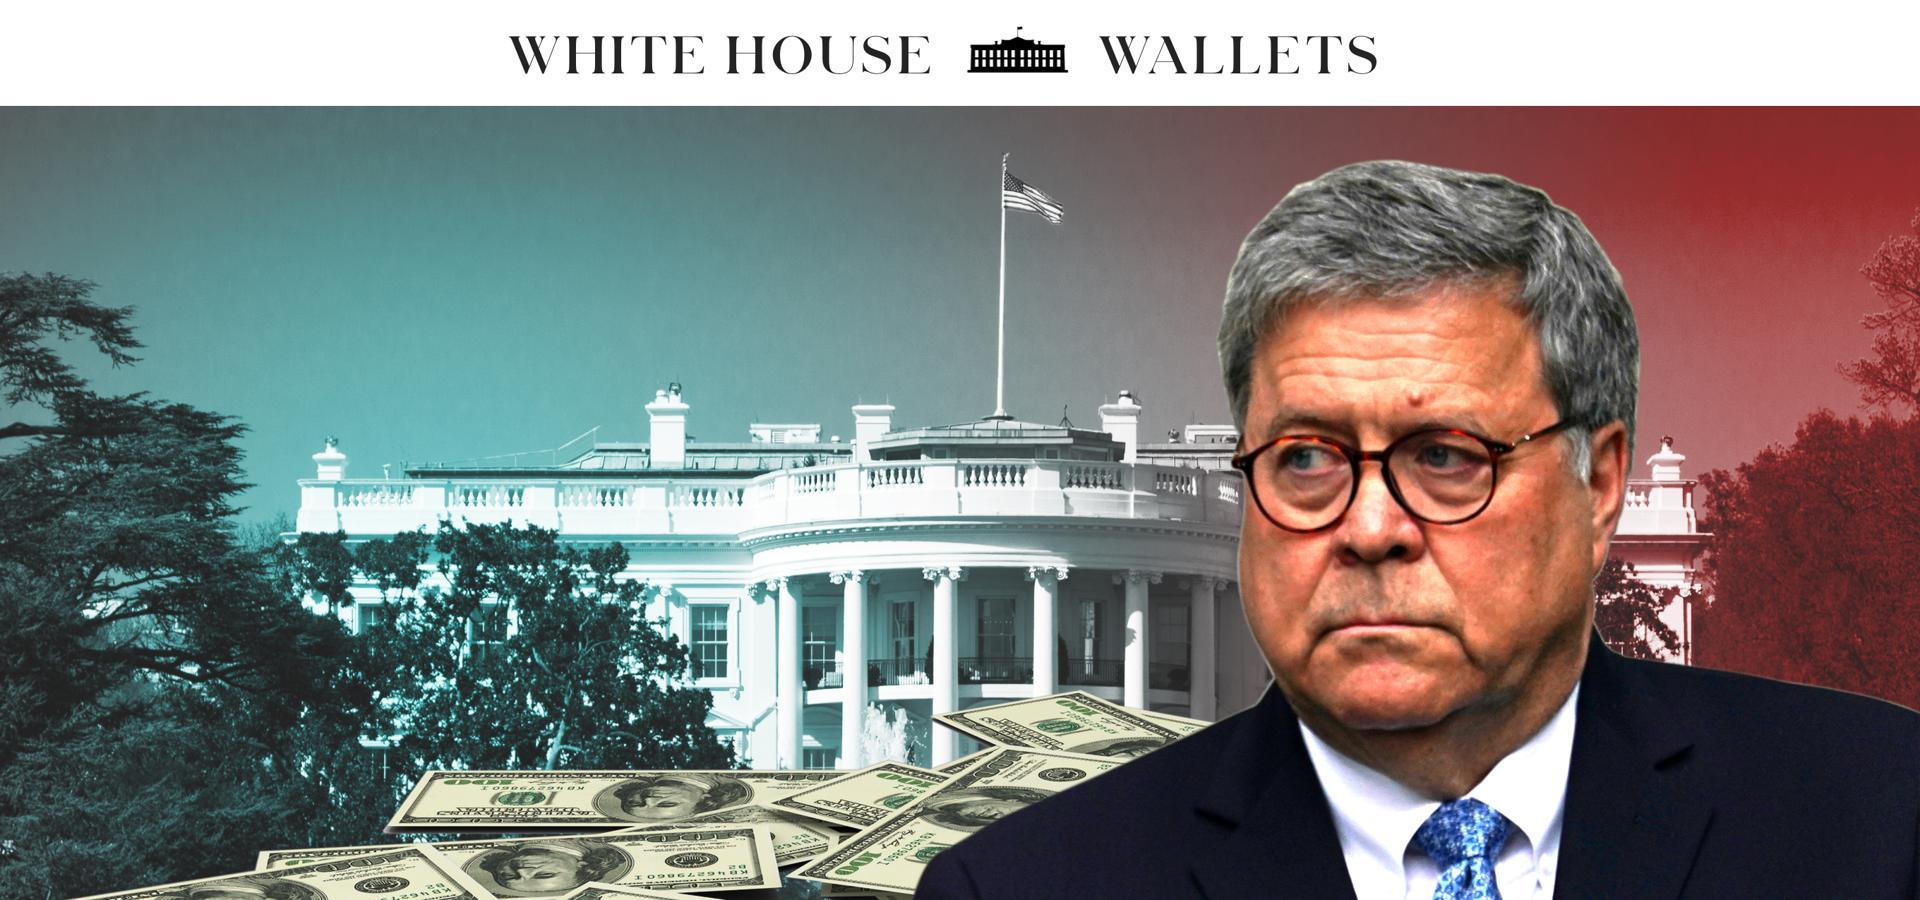 William Barr Net Worth